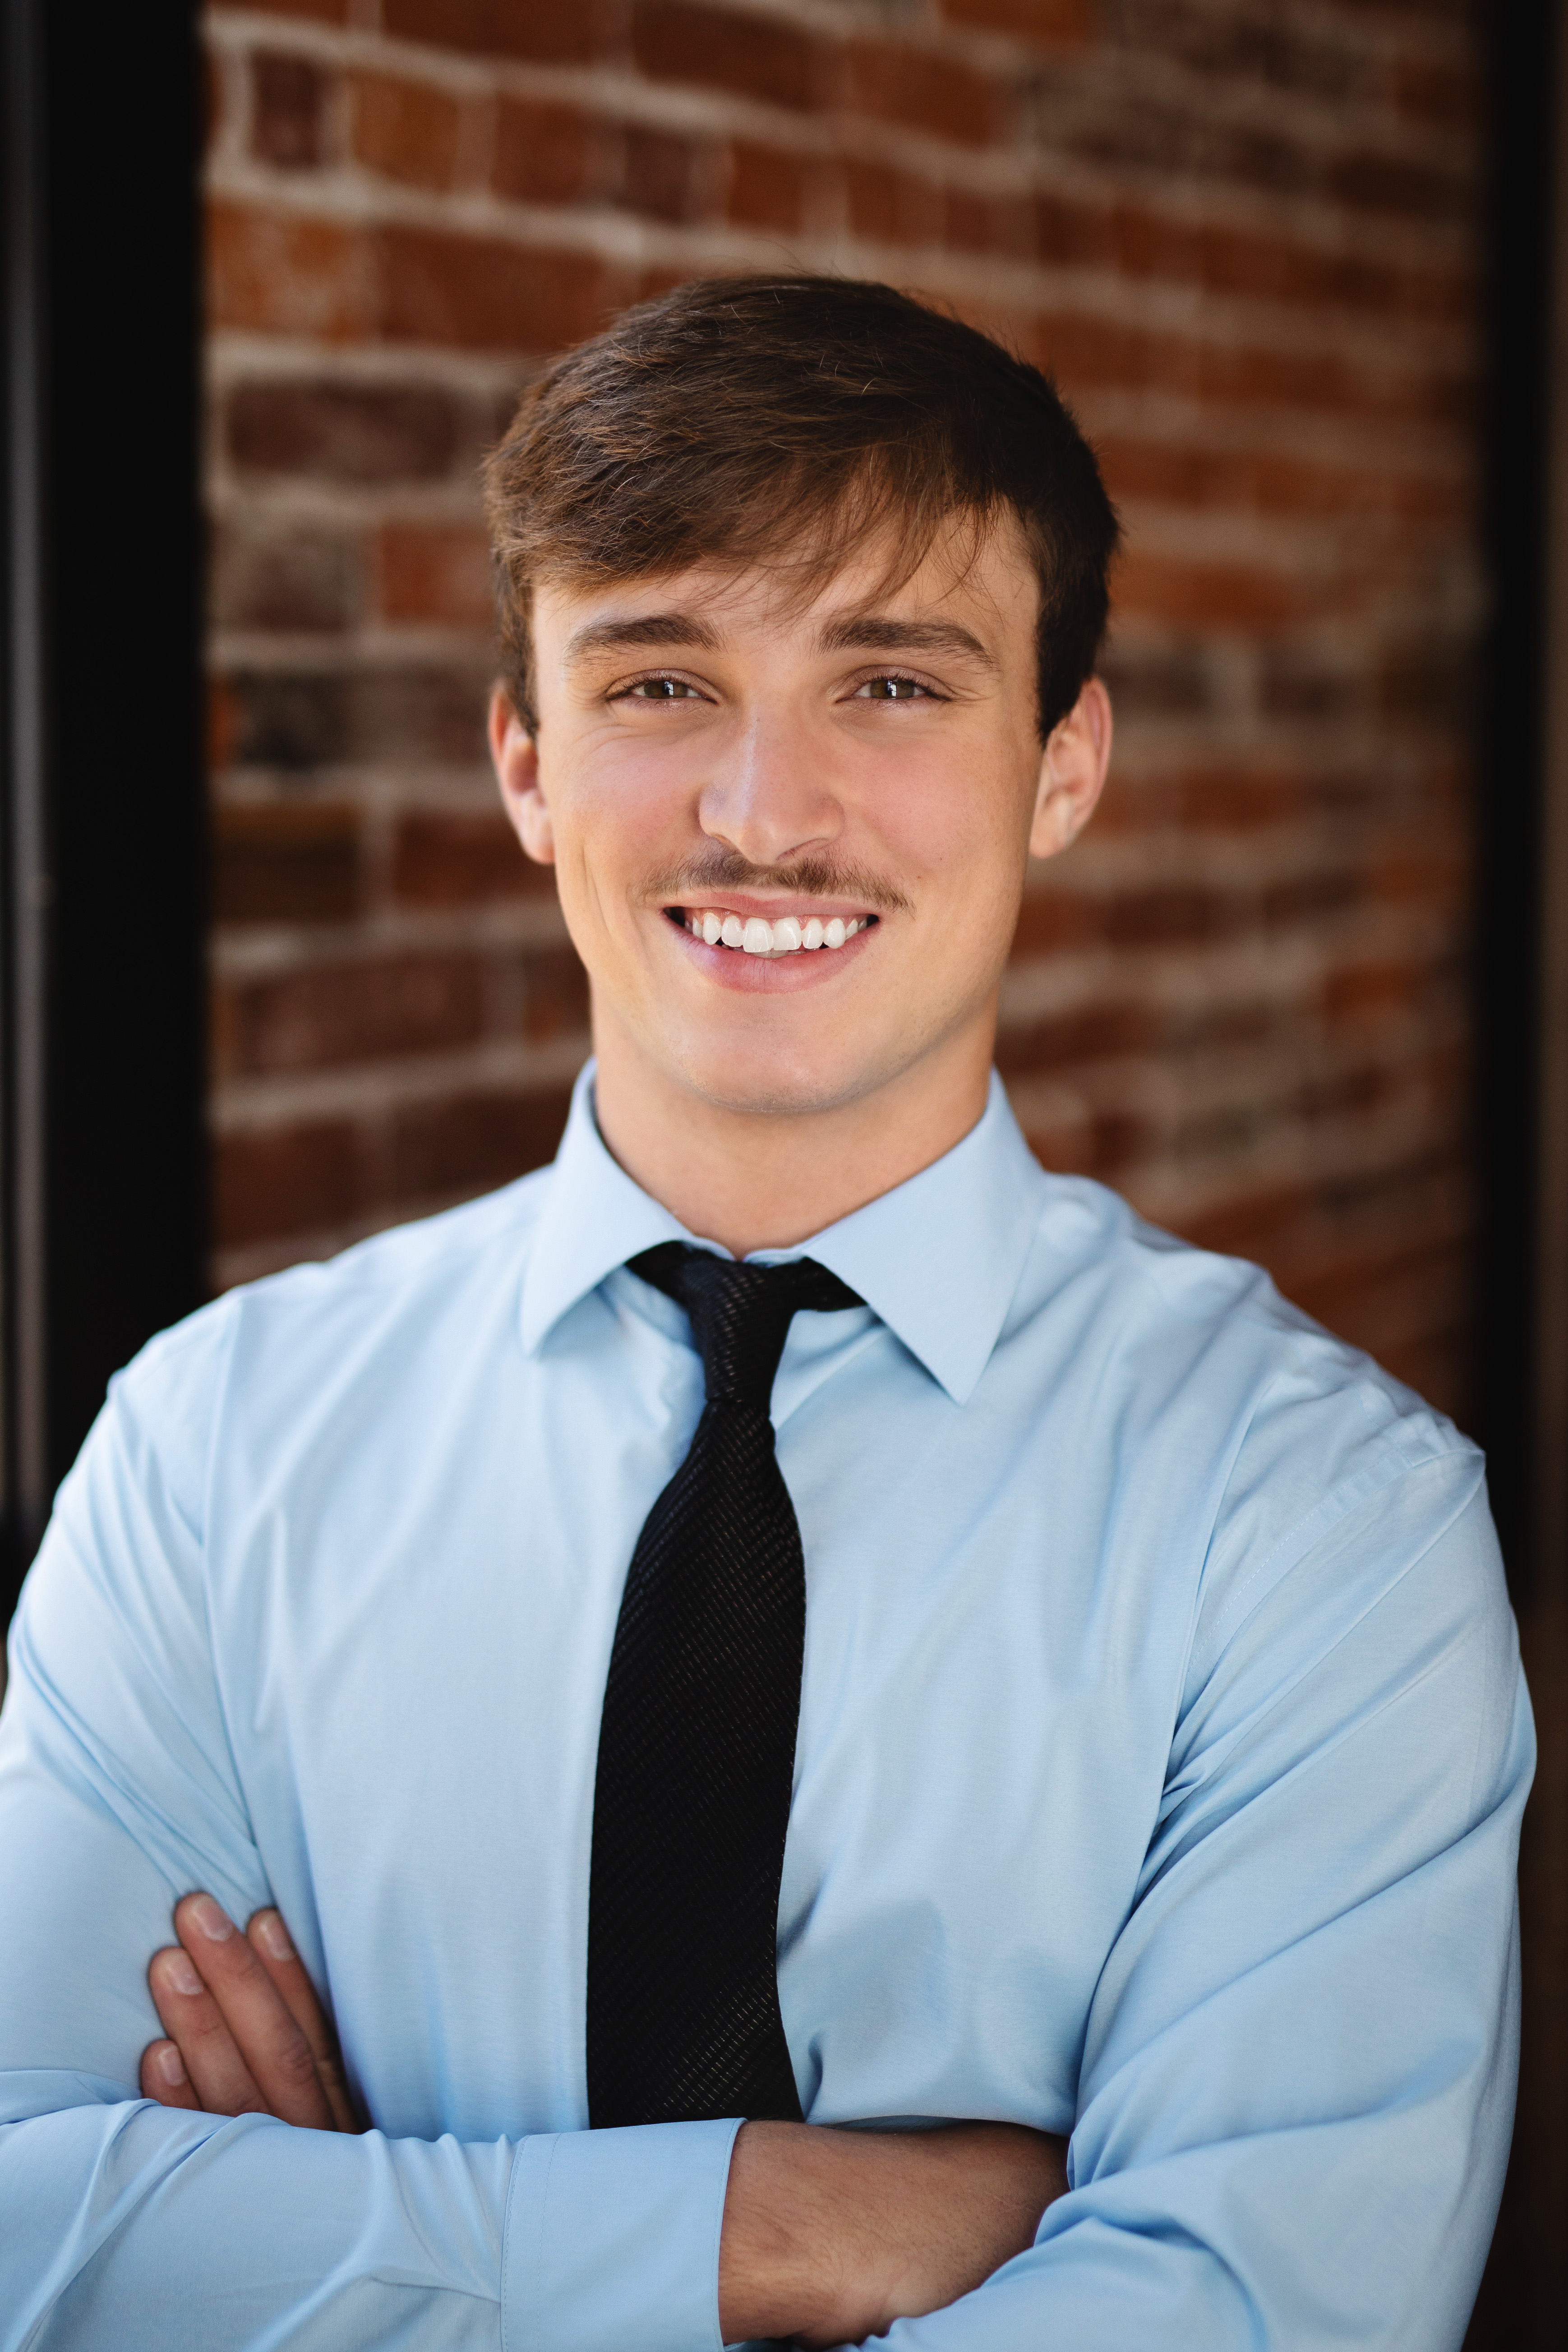 Gavin Sherar Real Estate Agent Coeur d'Alene